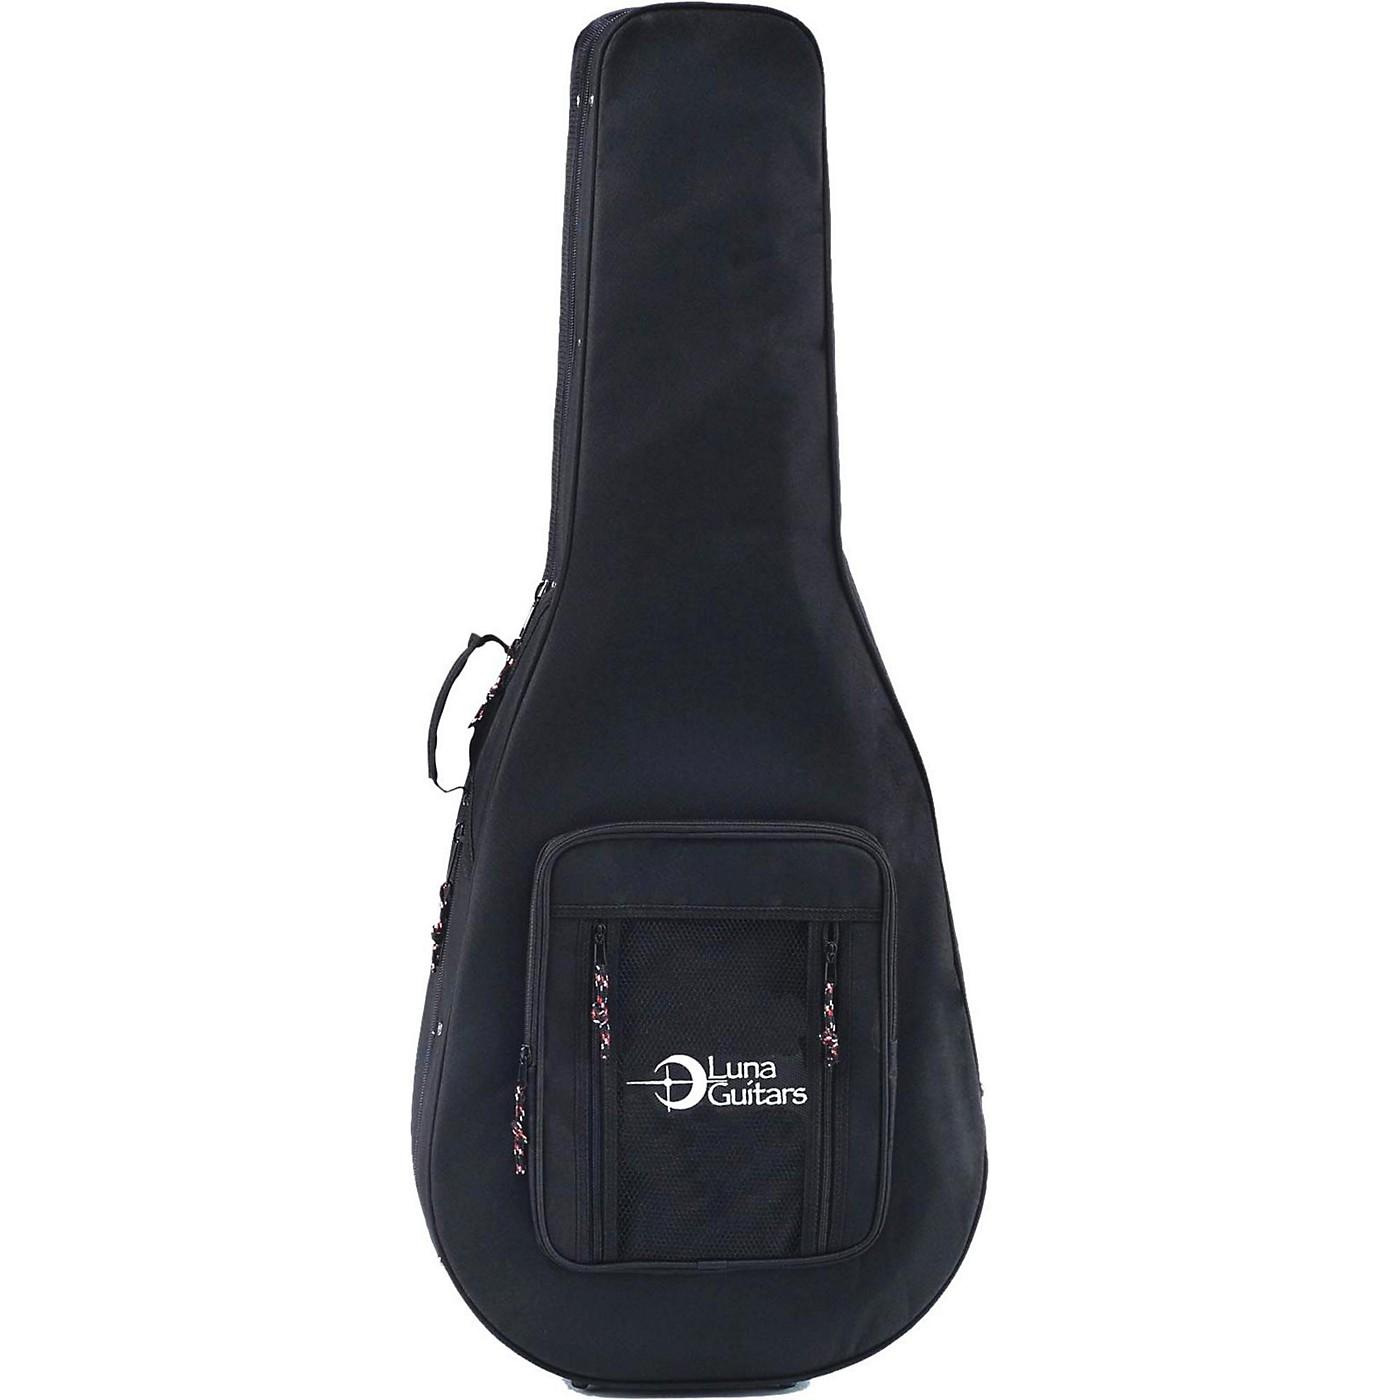 Luna Guitars Lightweight Case for Folk and Parlor Size Guitars thumbnail